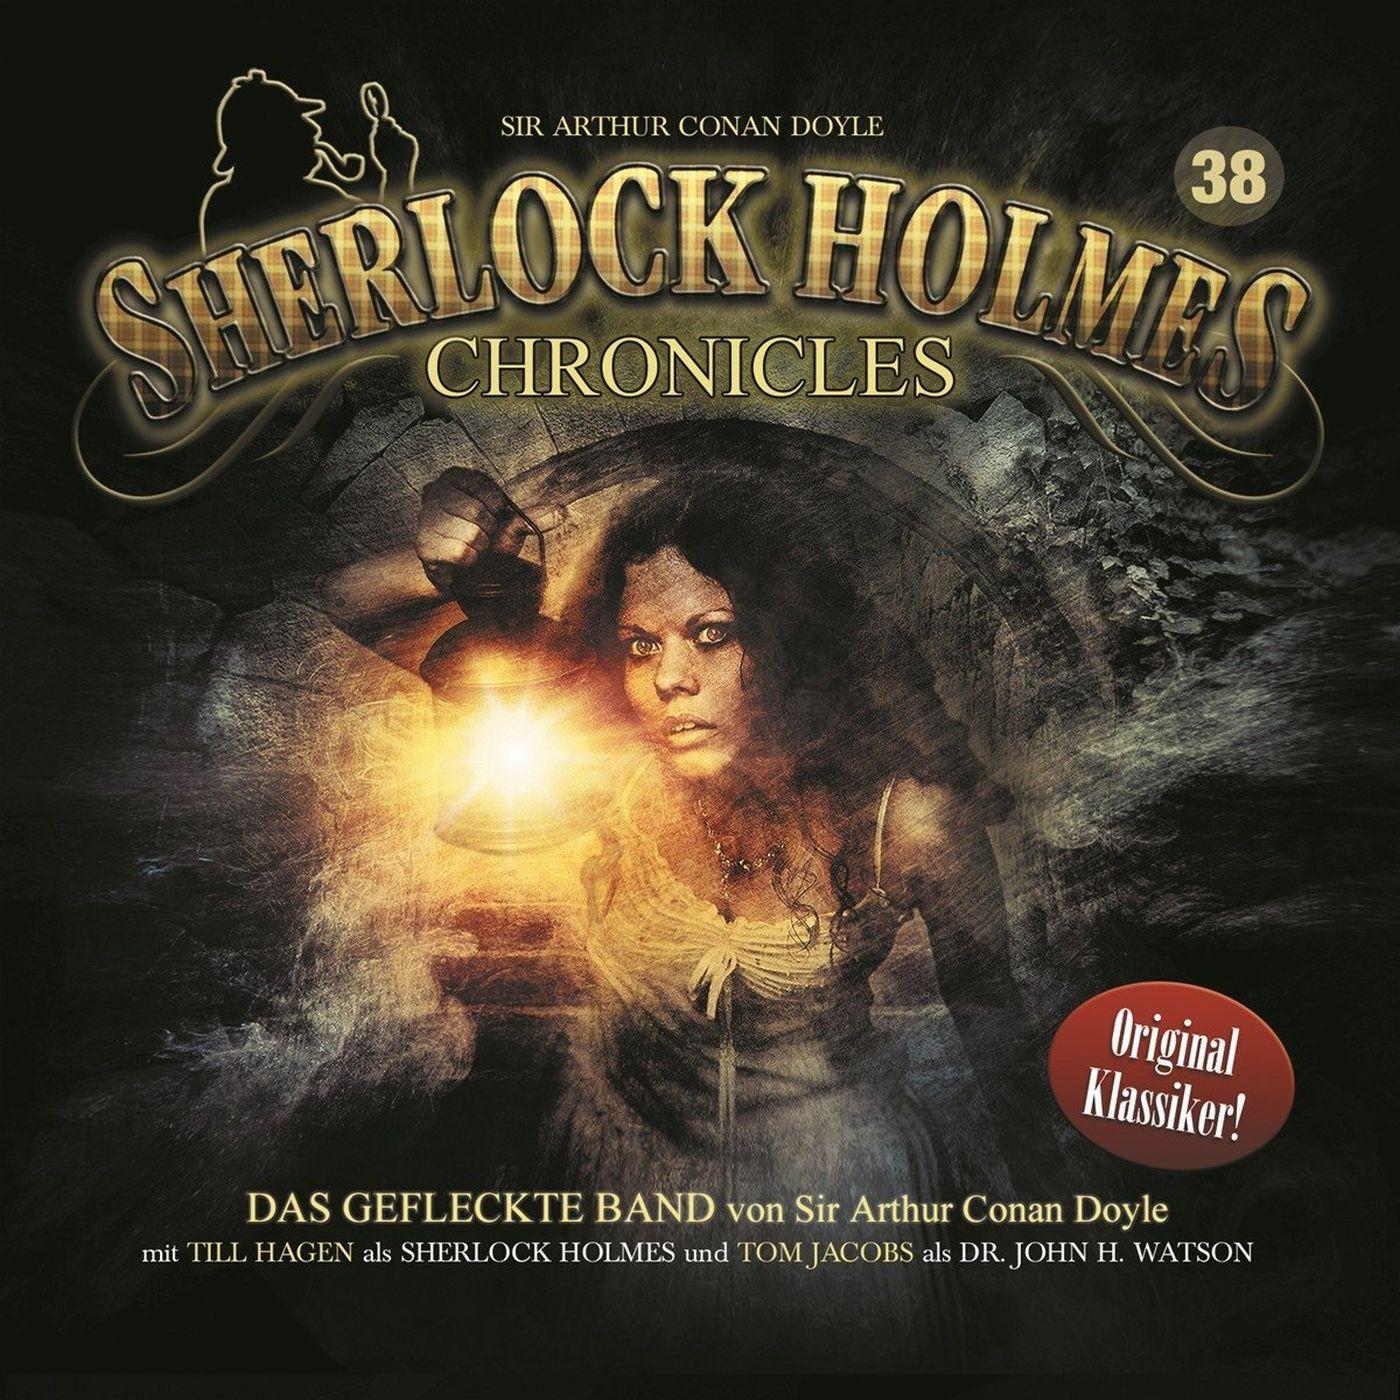 Sherlock Holmes Chronicles 38 Das gefleckte Band